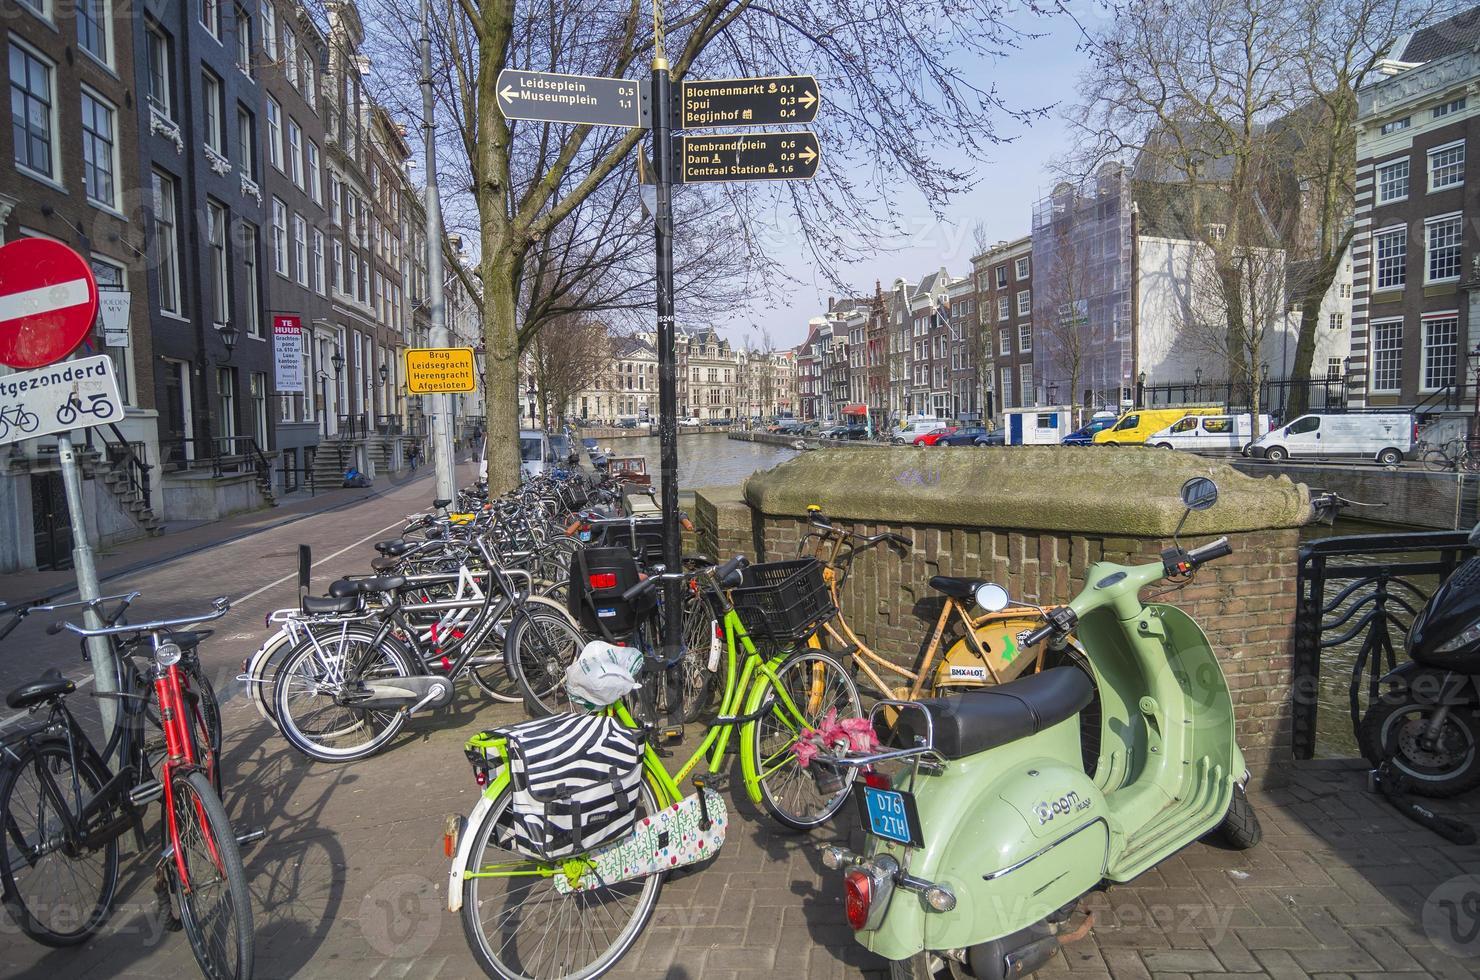 Fahrradabstellplatz am Kanal, Amsterdam. foto